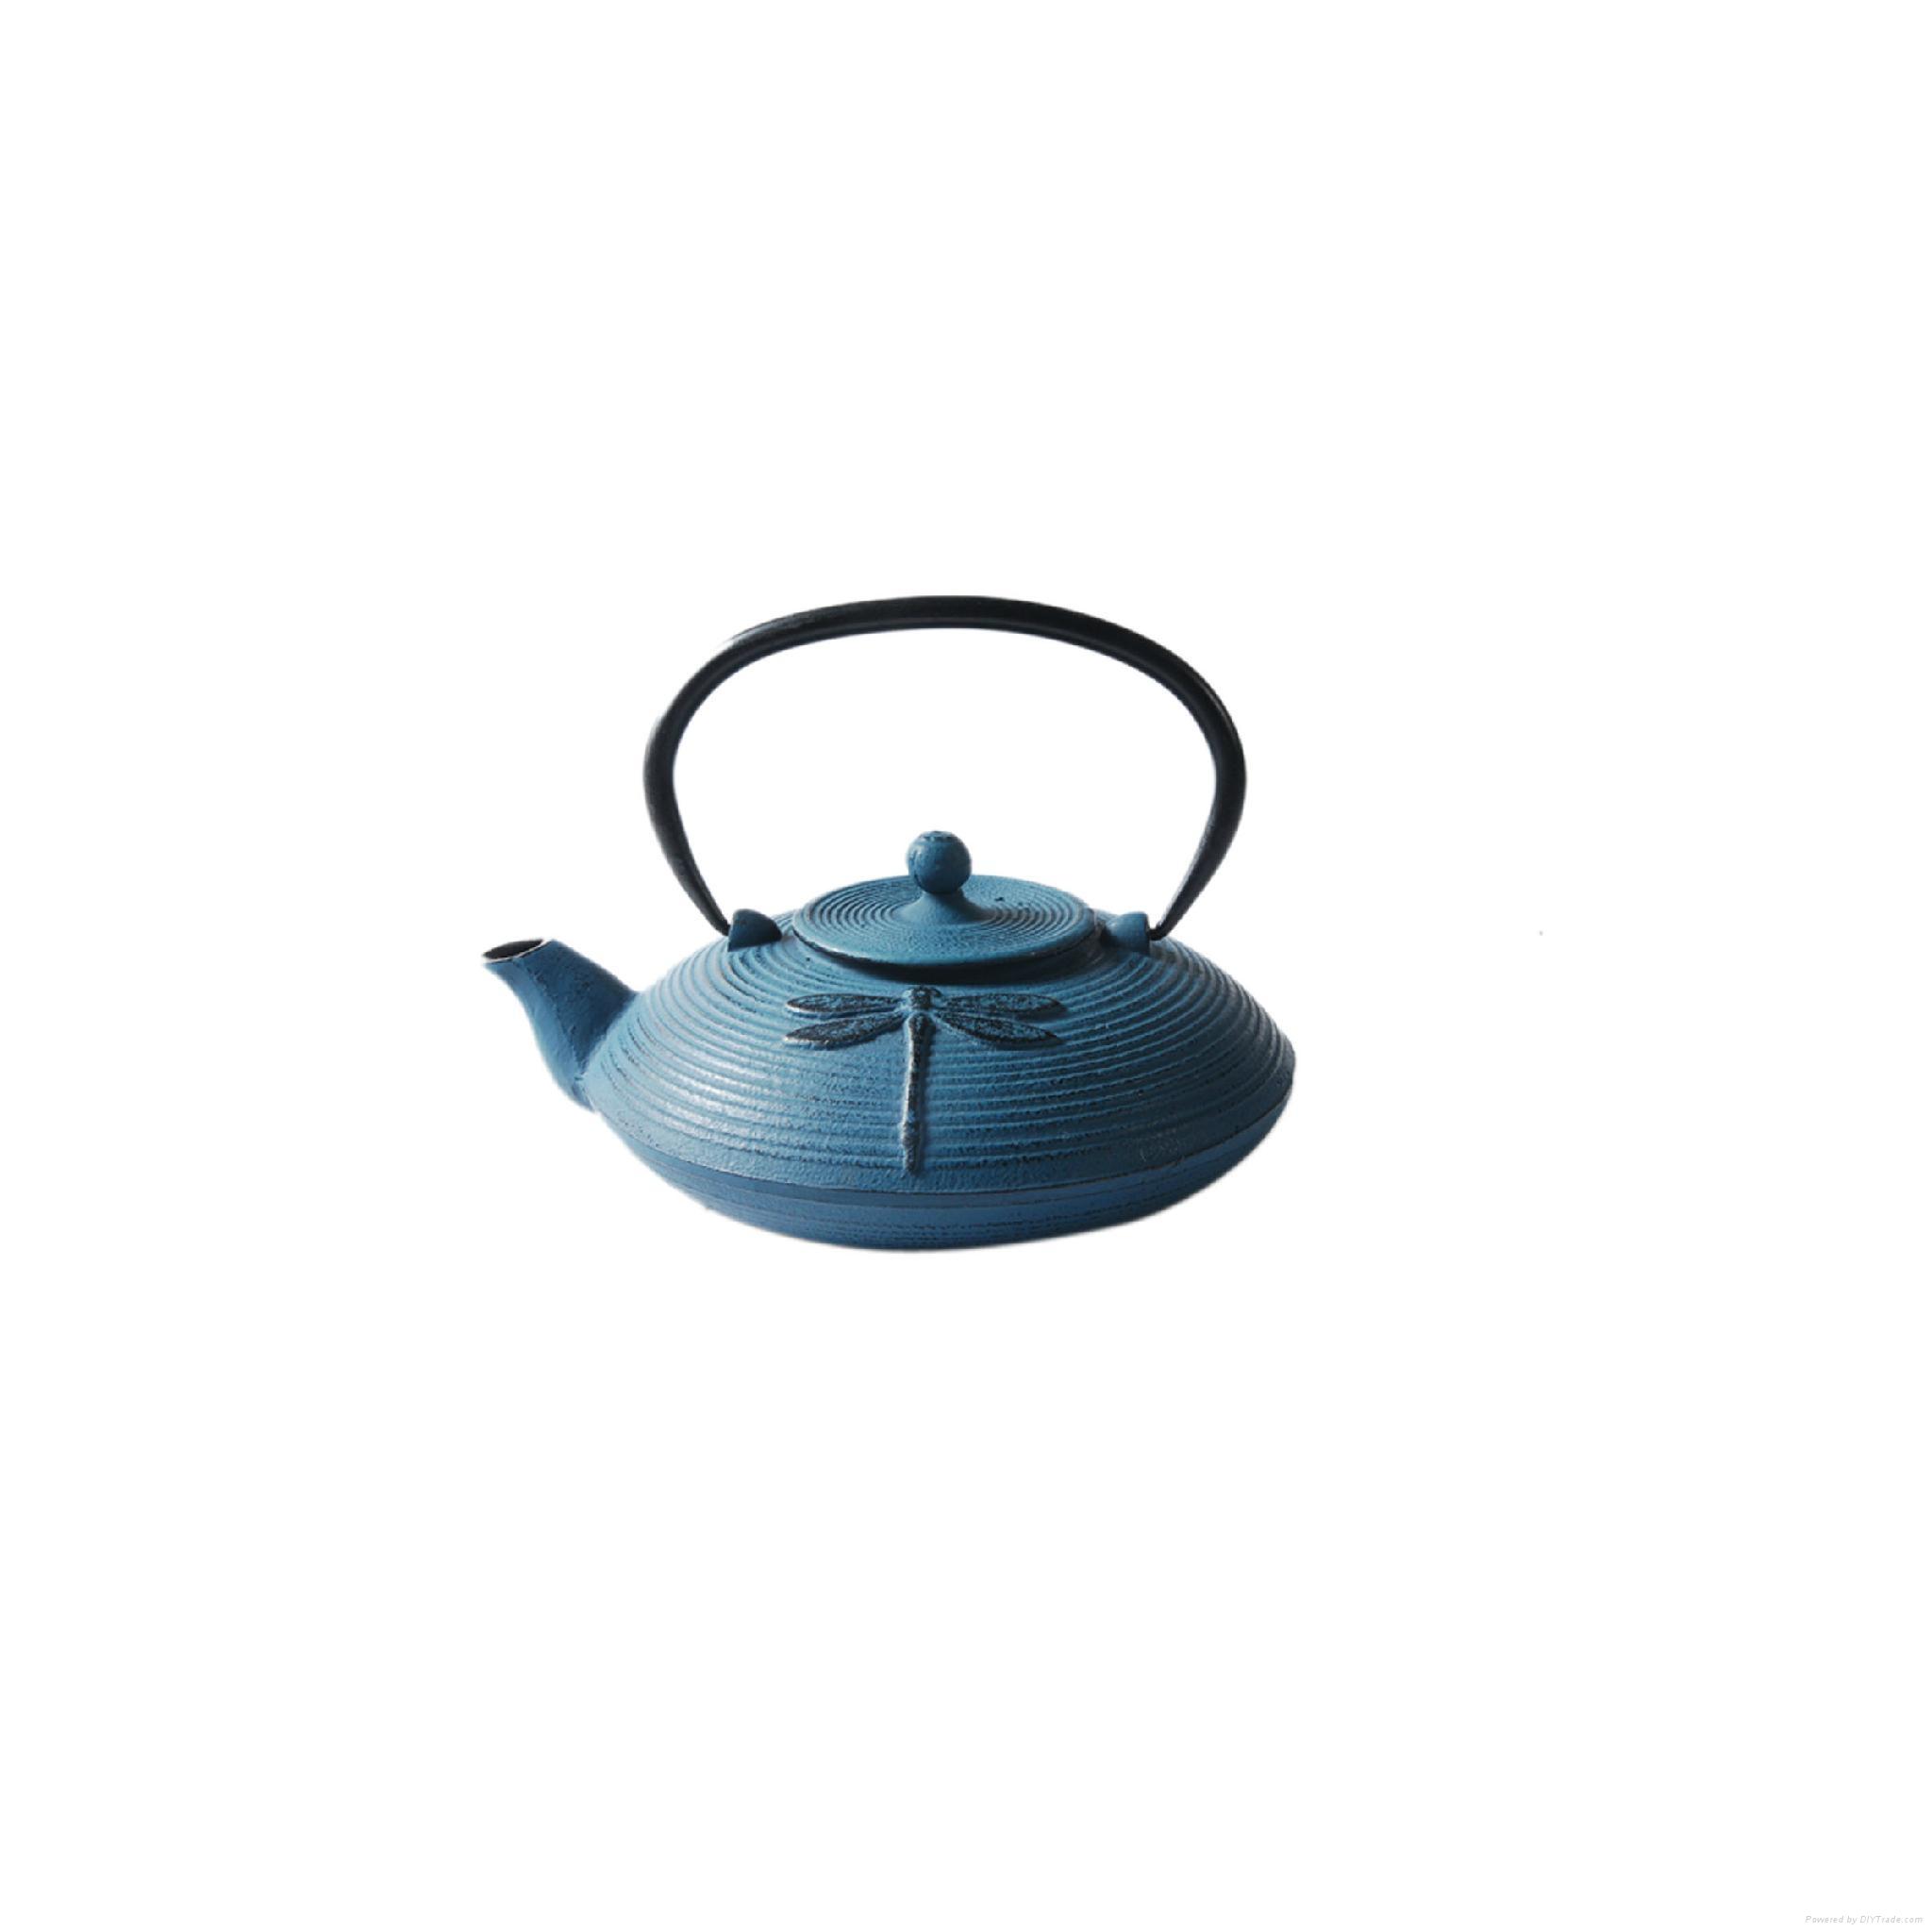 Dragonfly Cast Iron Teapot 1